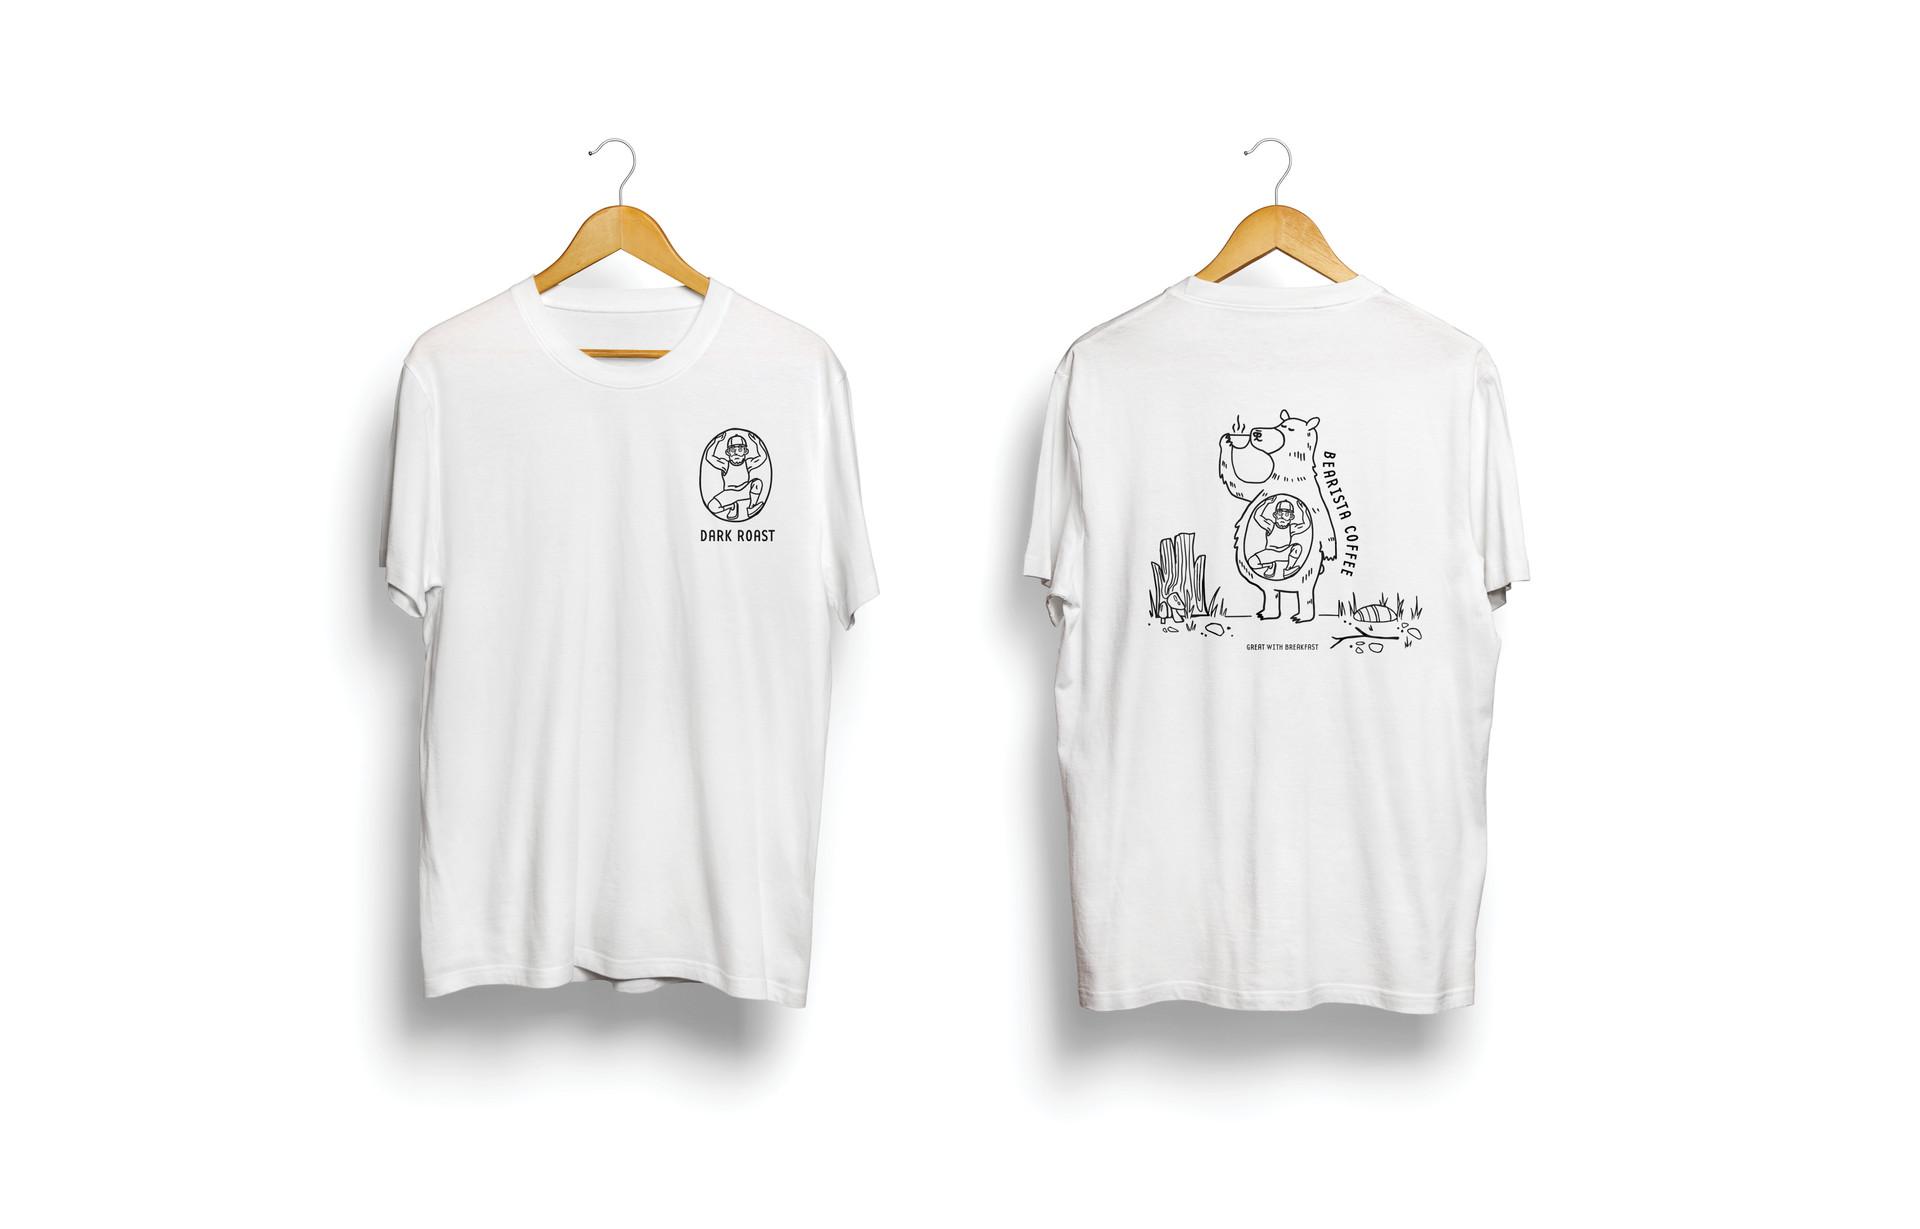 2020_FT1_BRI_BeccaDurbin_Wix website5.jp